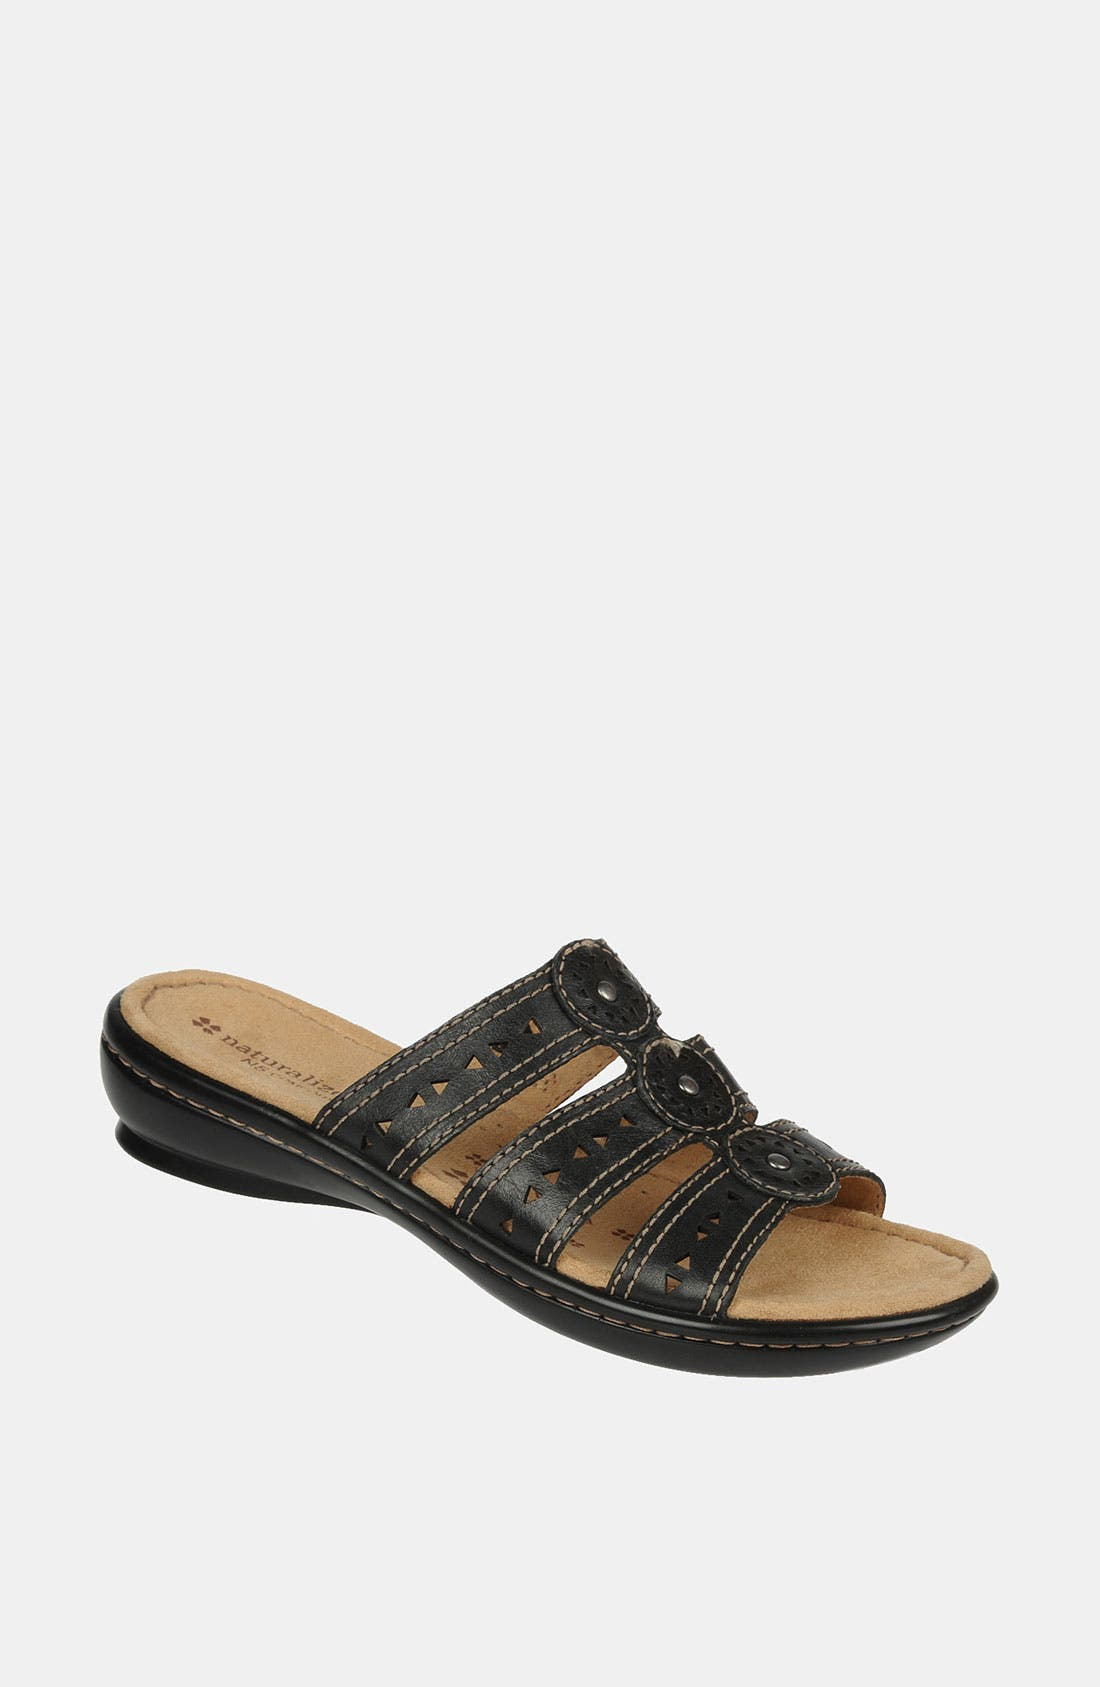 Main Image - Naturalizer 'Janae' Sandal